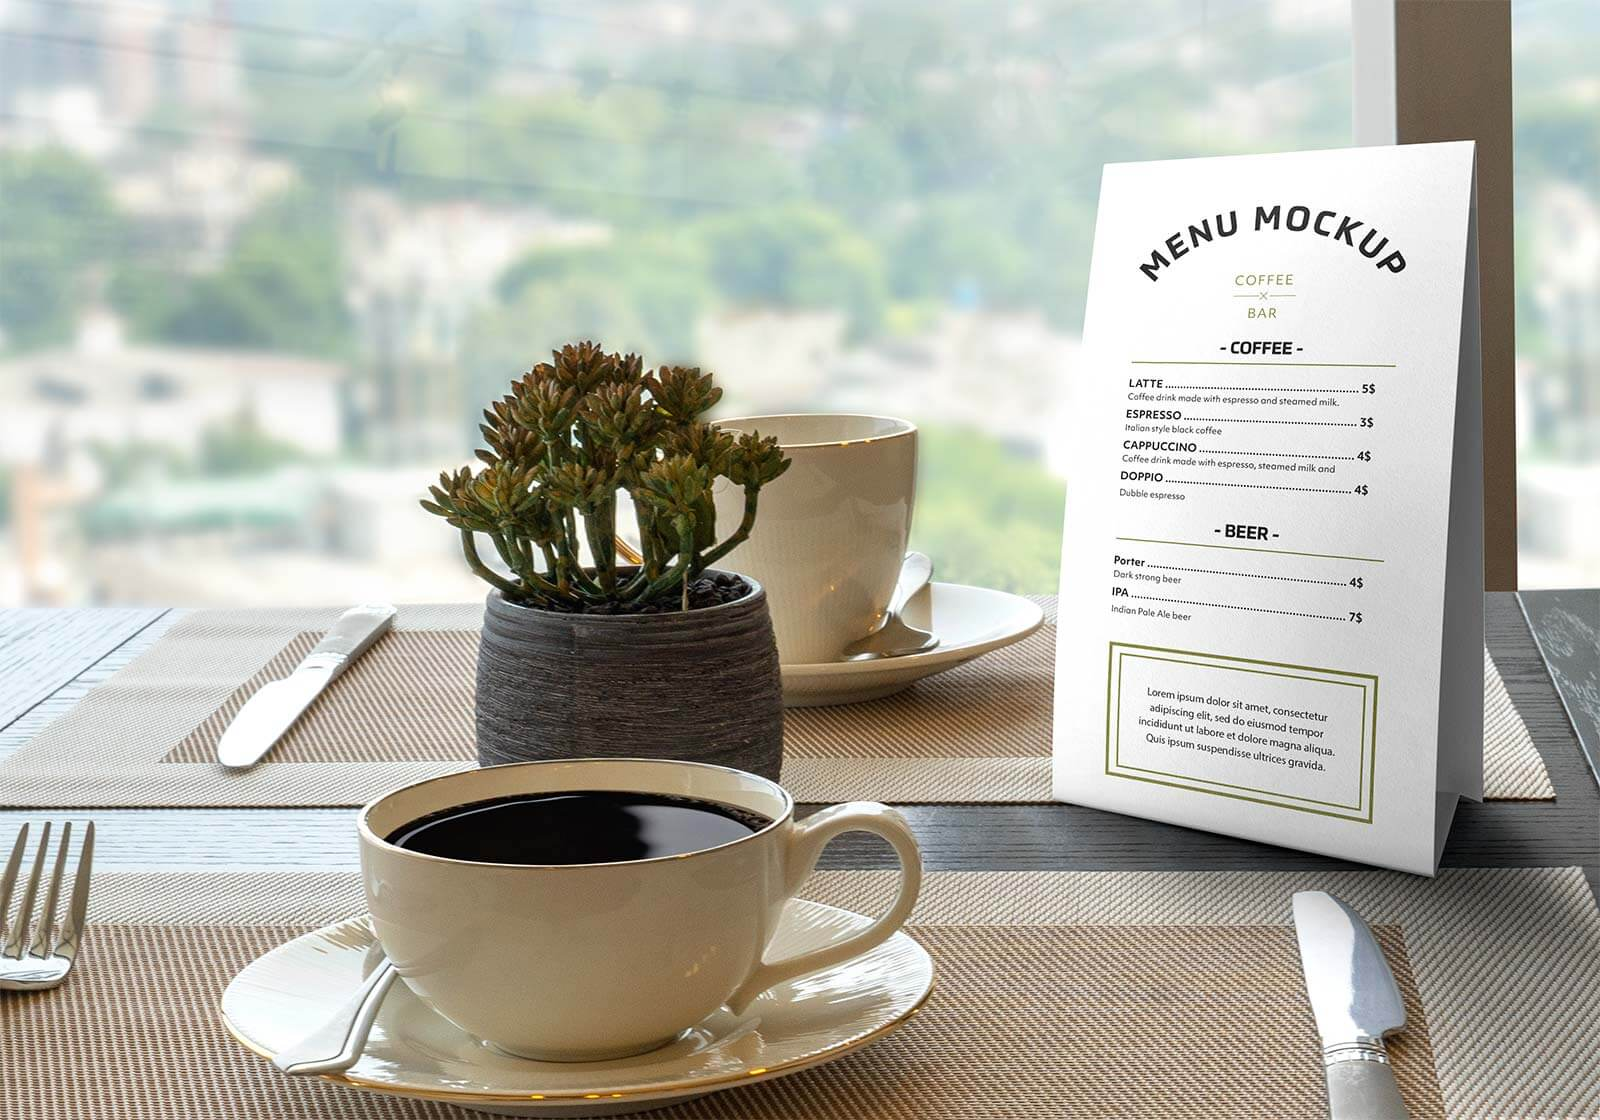 Free-Table-Tent-Menu-Card-Mockup-PSD-2